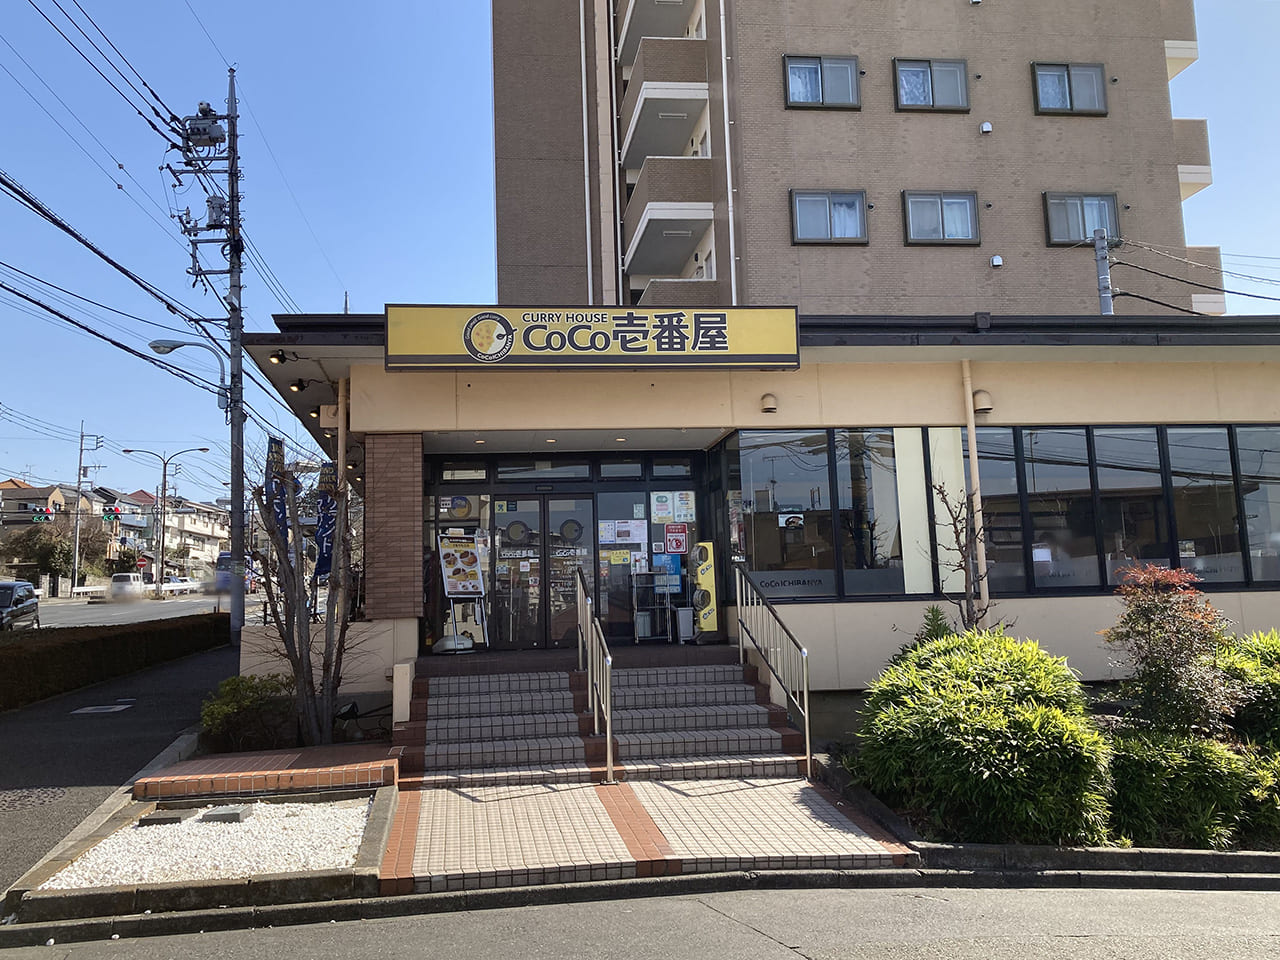 CoCo壱番屋多摩桜ケ丘店が2月14日に閉店するそうです